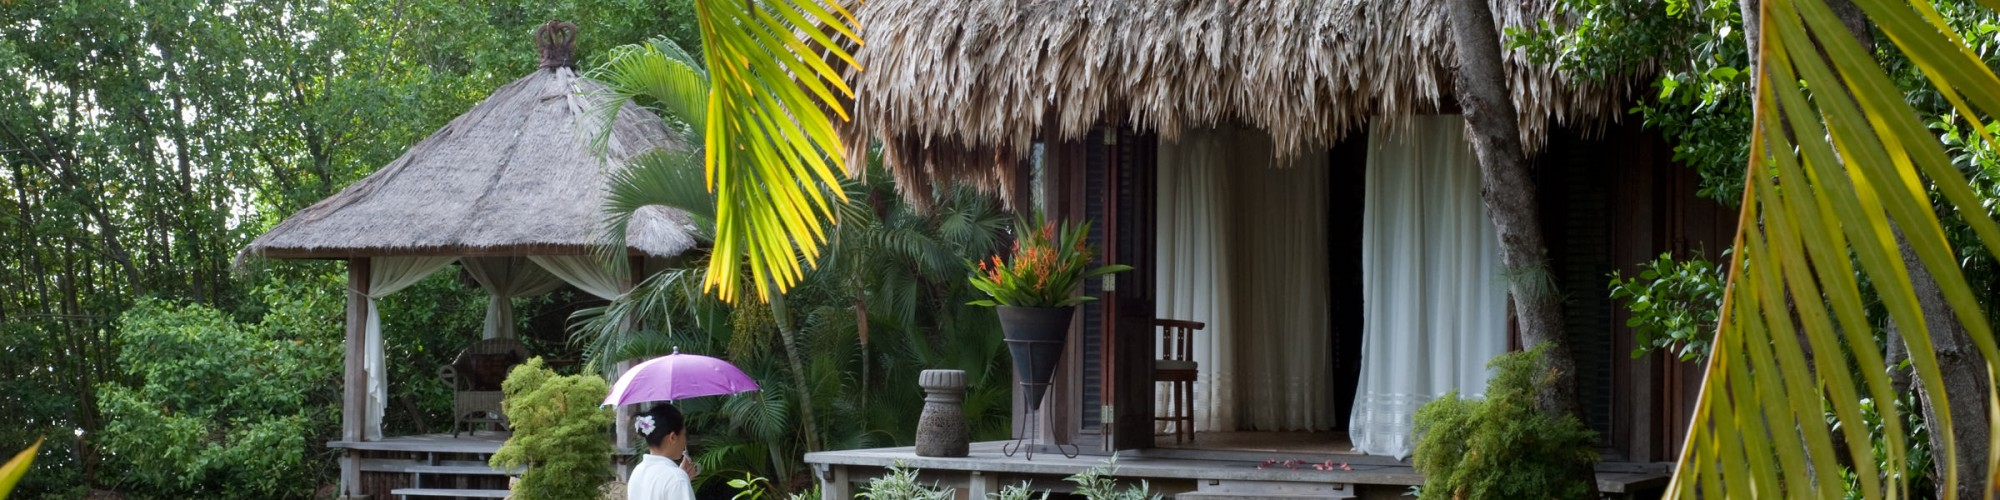 Belize - Placencia - Turtle Inn - Spa